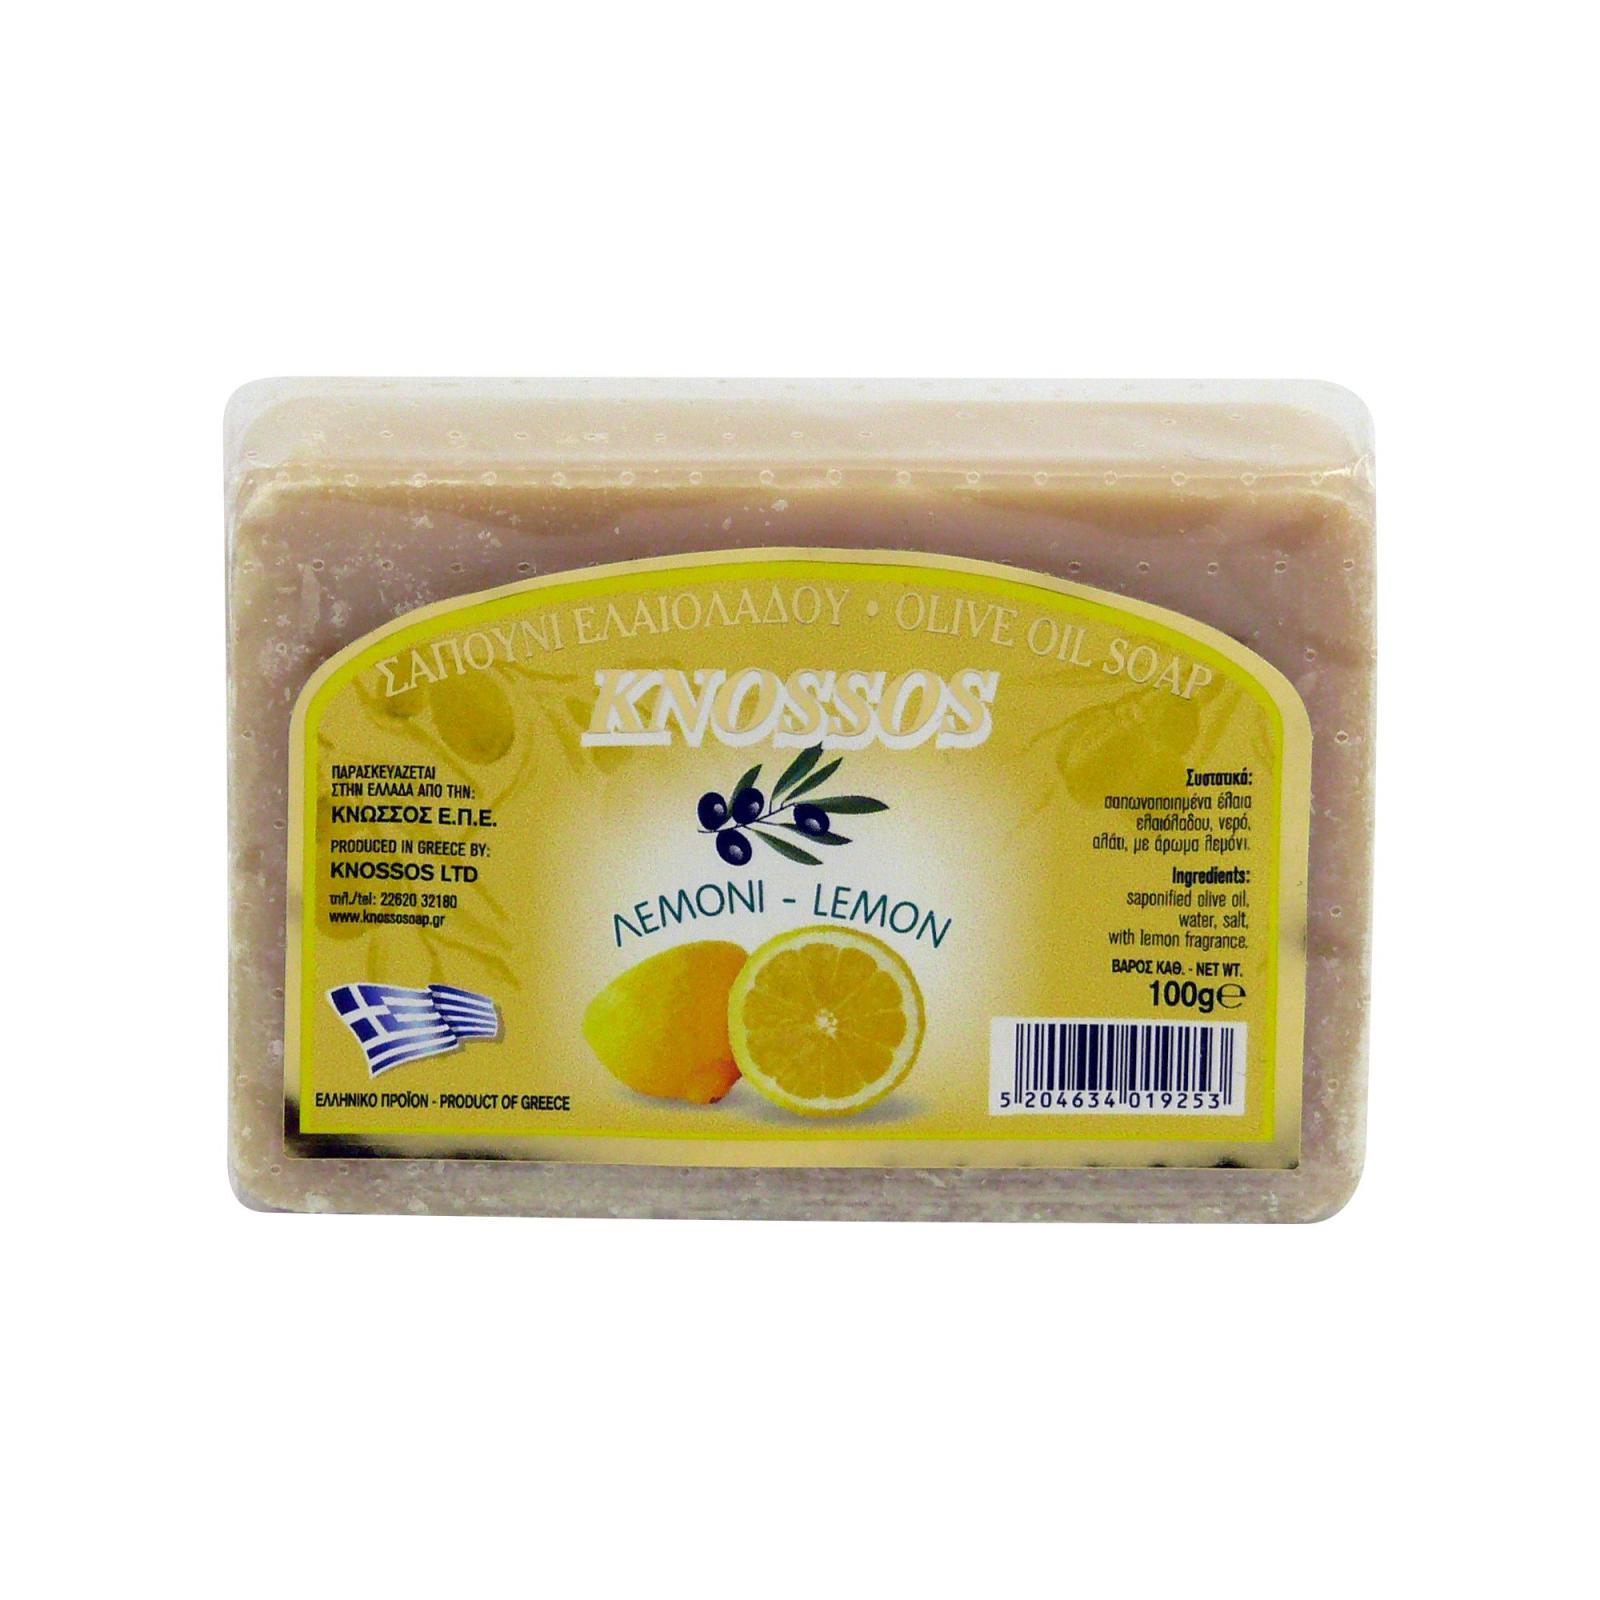 Knossos Mýdlo tuhé olivové, citron 100 g